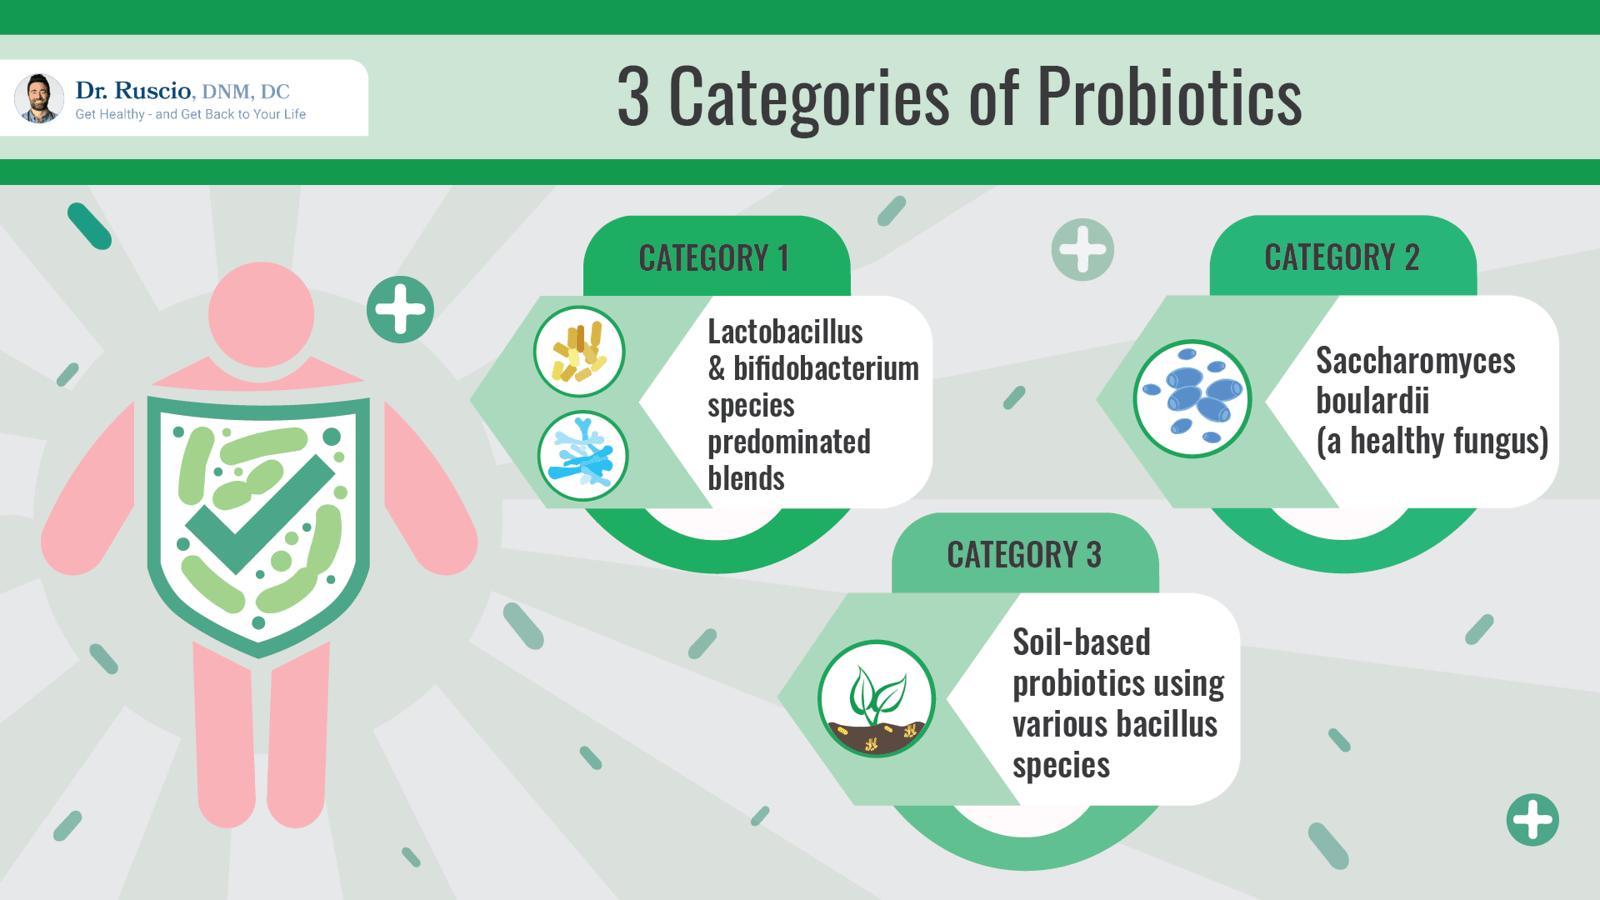 3 Categories of Probiotics